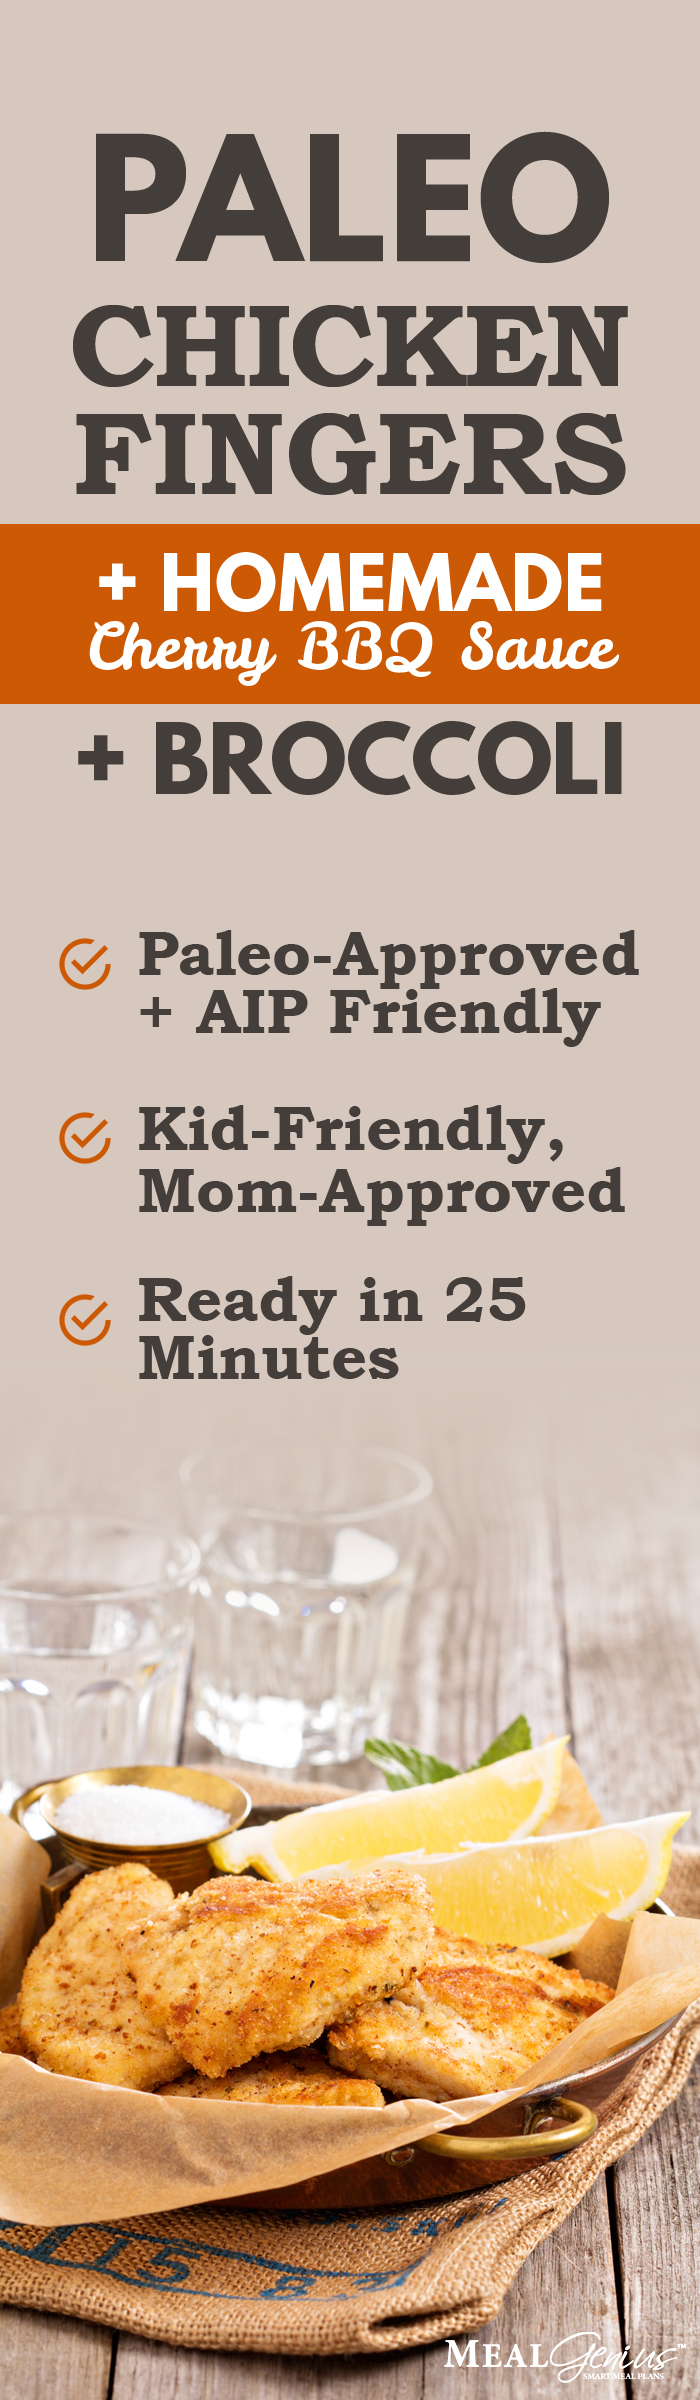 Paleo Chicken Fingers with Cherry BBQ - AIP Diet